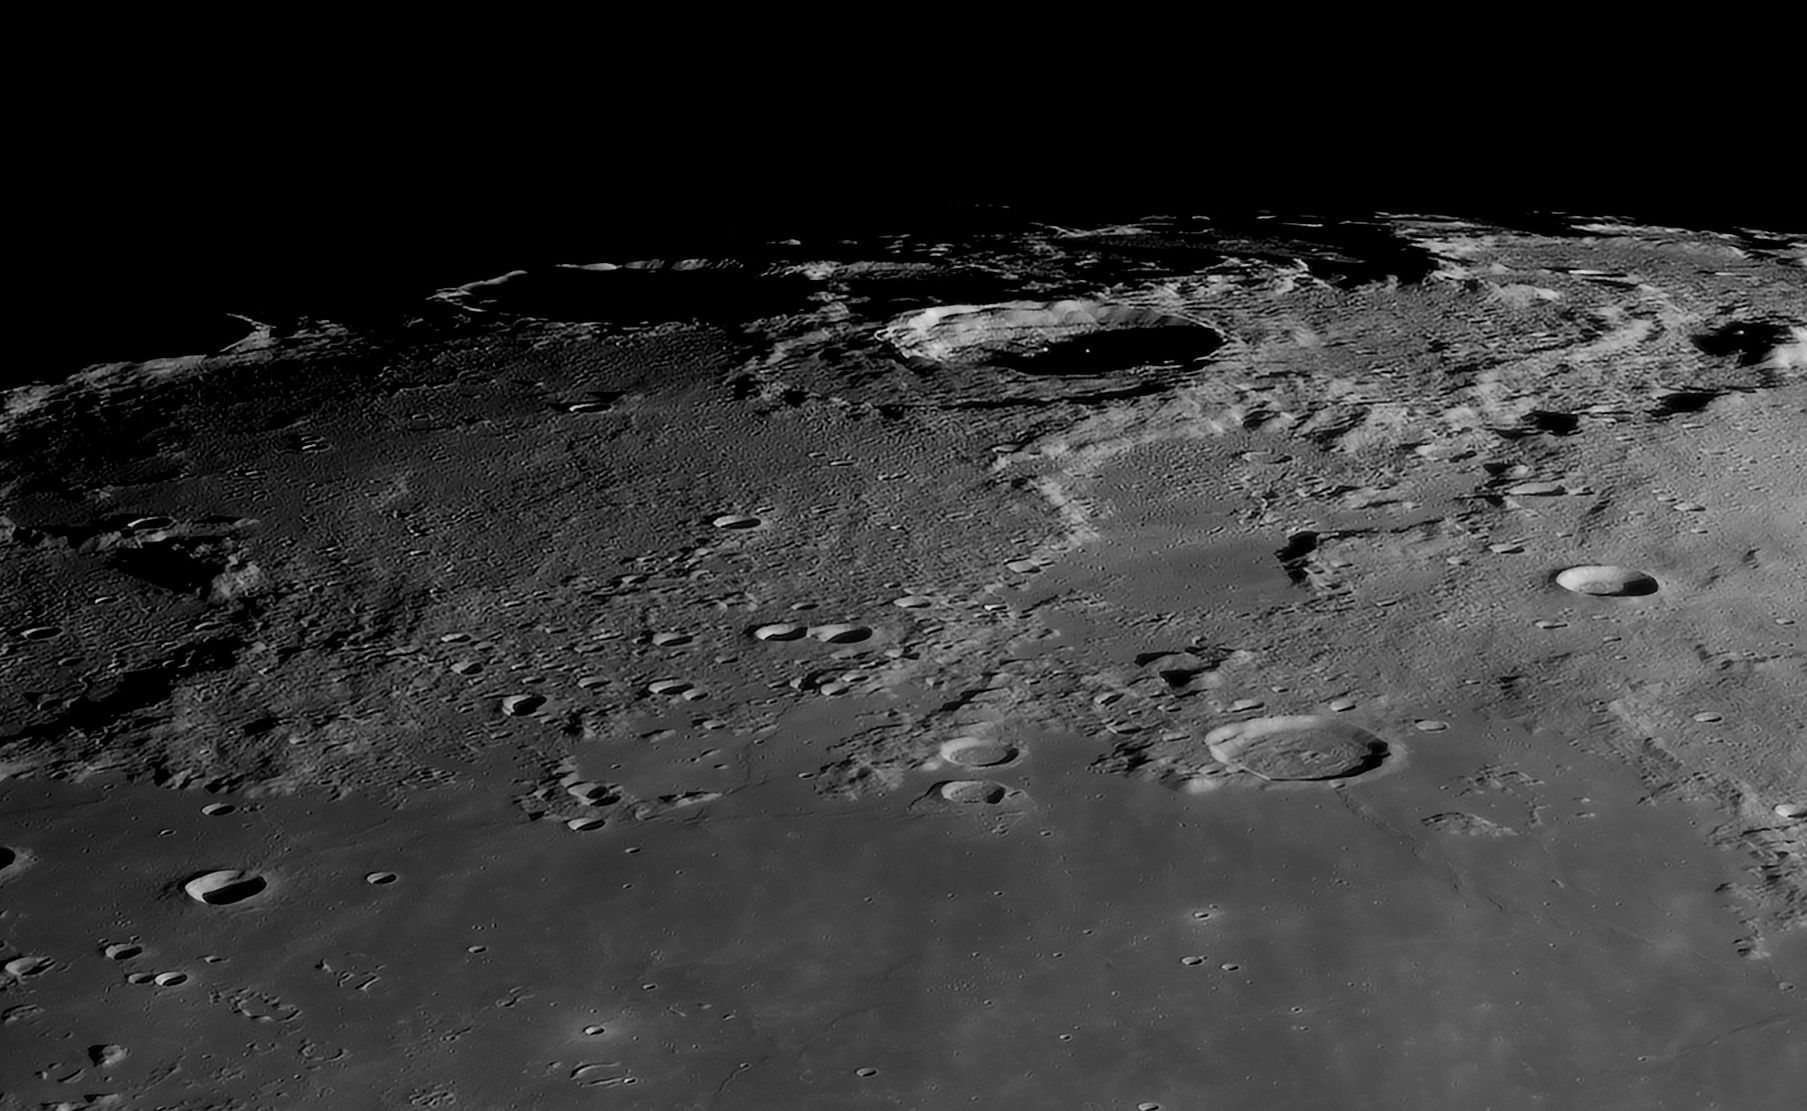 Philolaus au C14, le 4 Avril 2020: 225 images, caméra 174MM, Baader FFC, ADC Pierro Astro, filtre Astronomik orange 2c